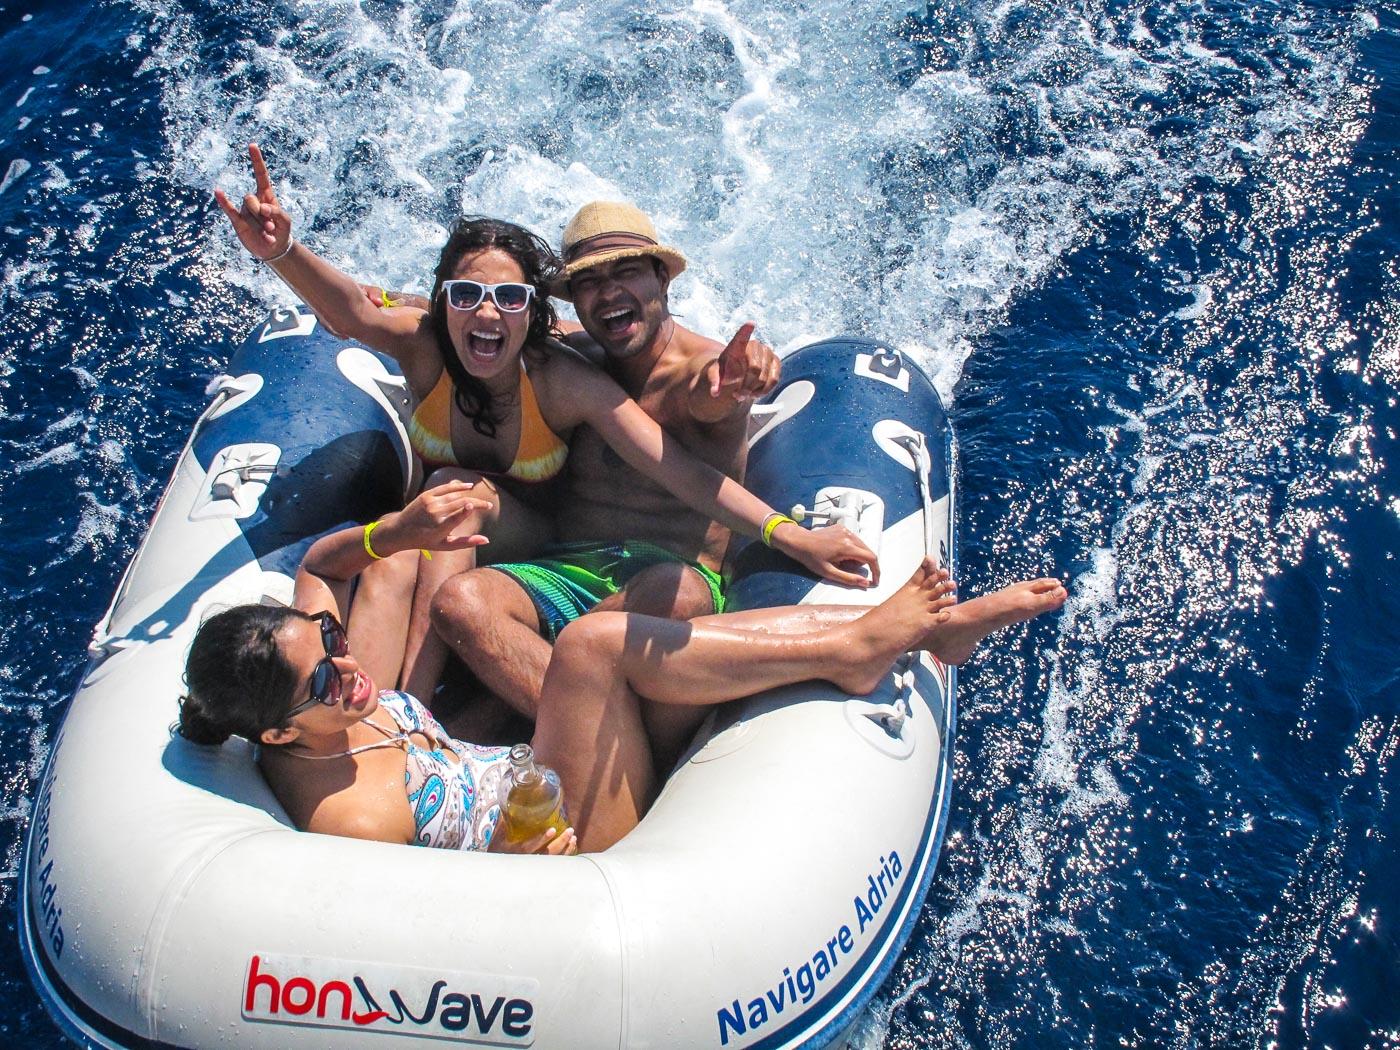 The_Yacht_Week_Sailing_Boat_Croatia_Europe_Summer_Trip_Party_Luxury_Lifestyle_SassyPilgrim_Travel_Blog_Indian_Blogger_Solo_Traveler_Female_Hvar_Split__Kastella_Skedro_Soltar_Viz_Zadar_Dubronvik